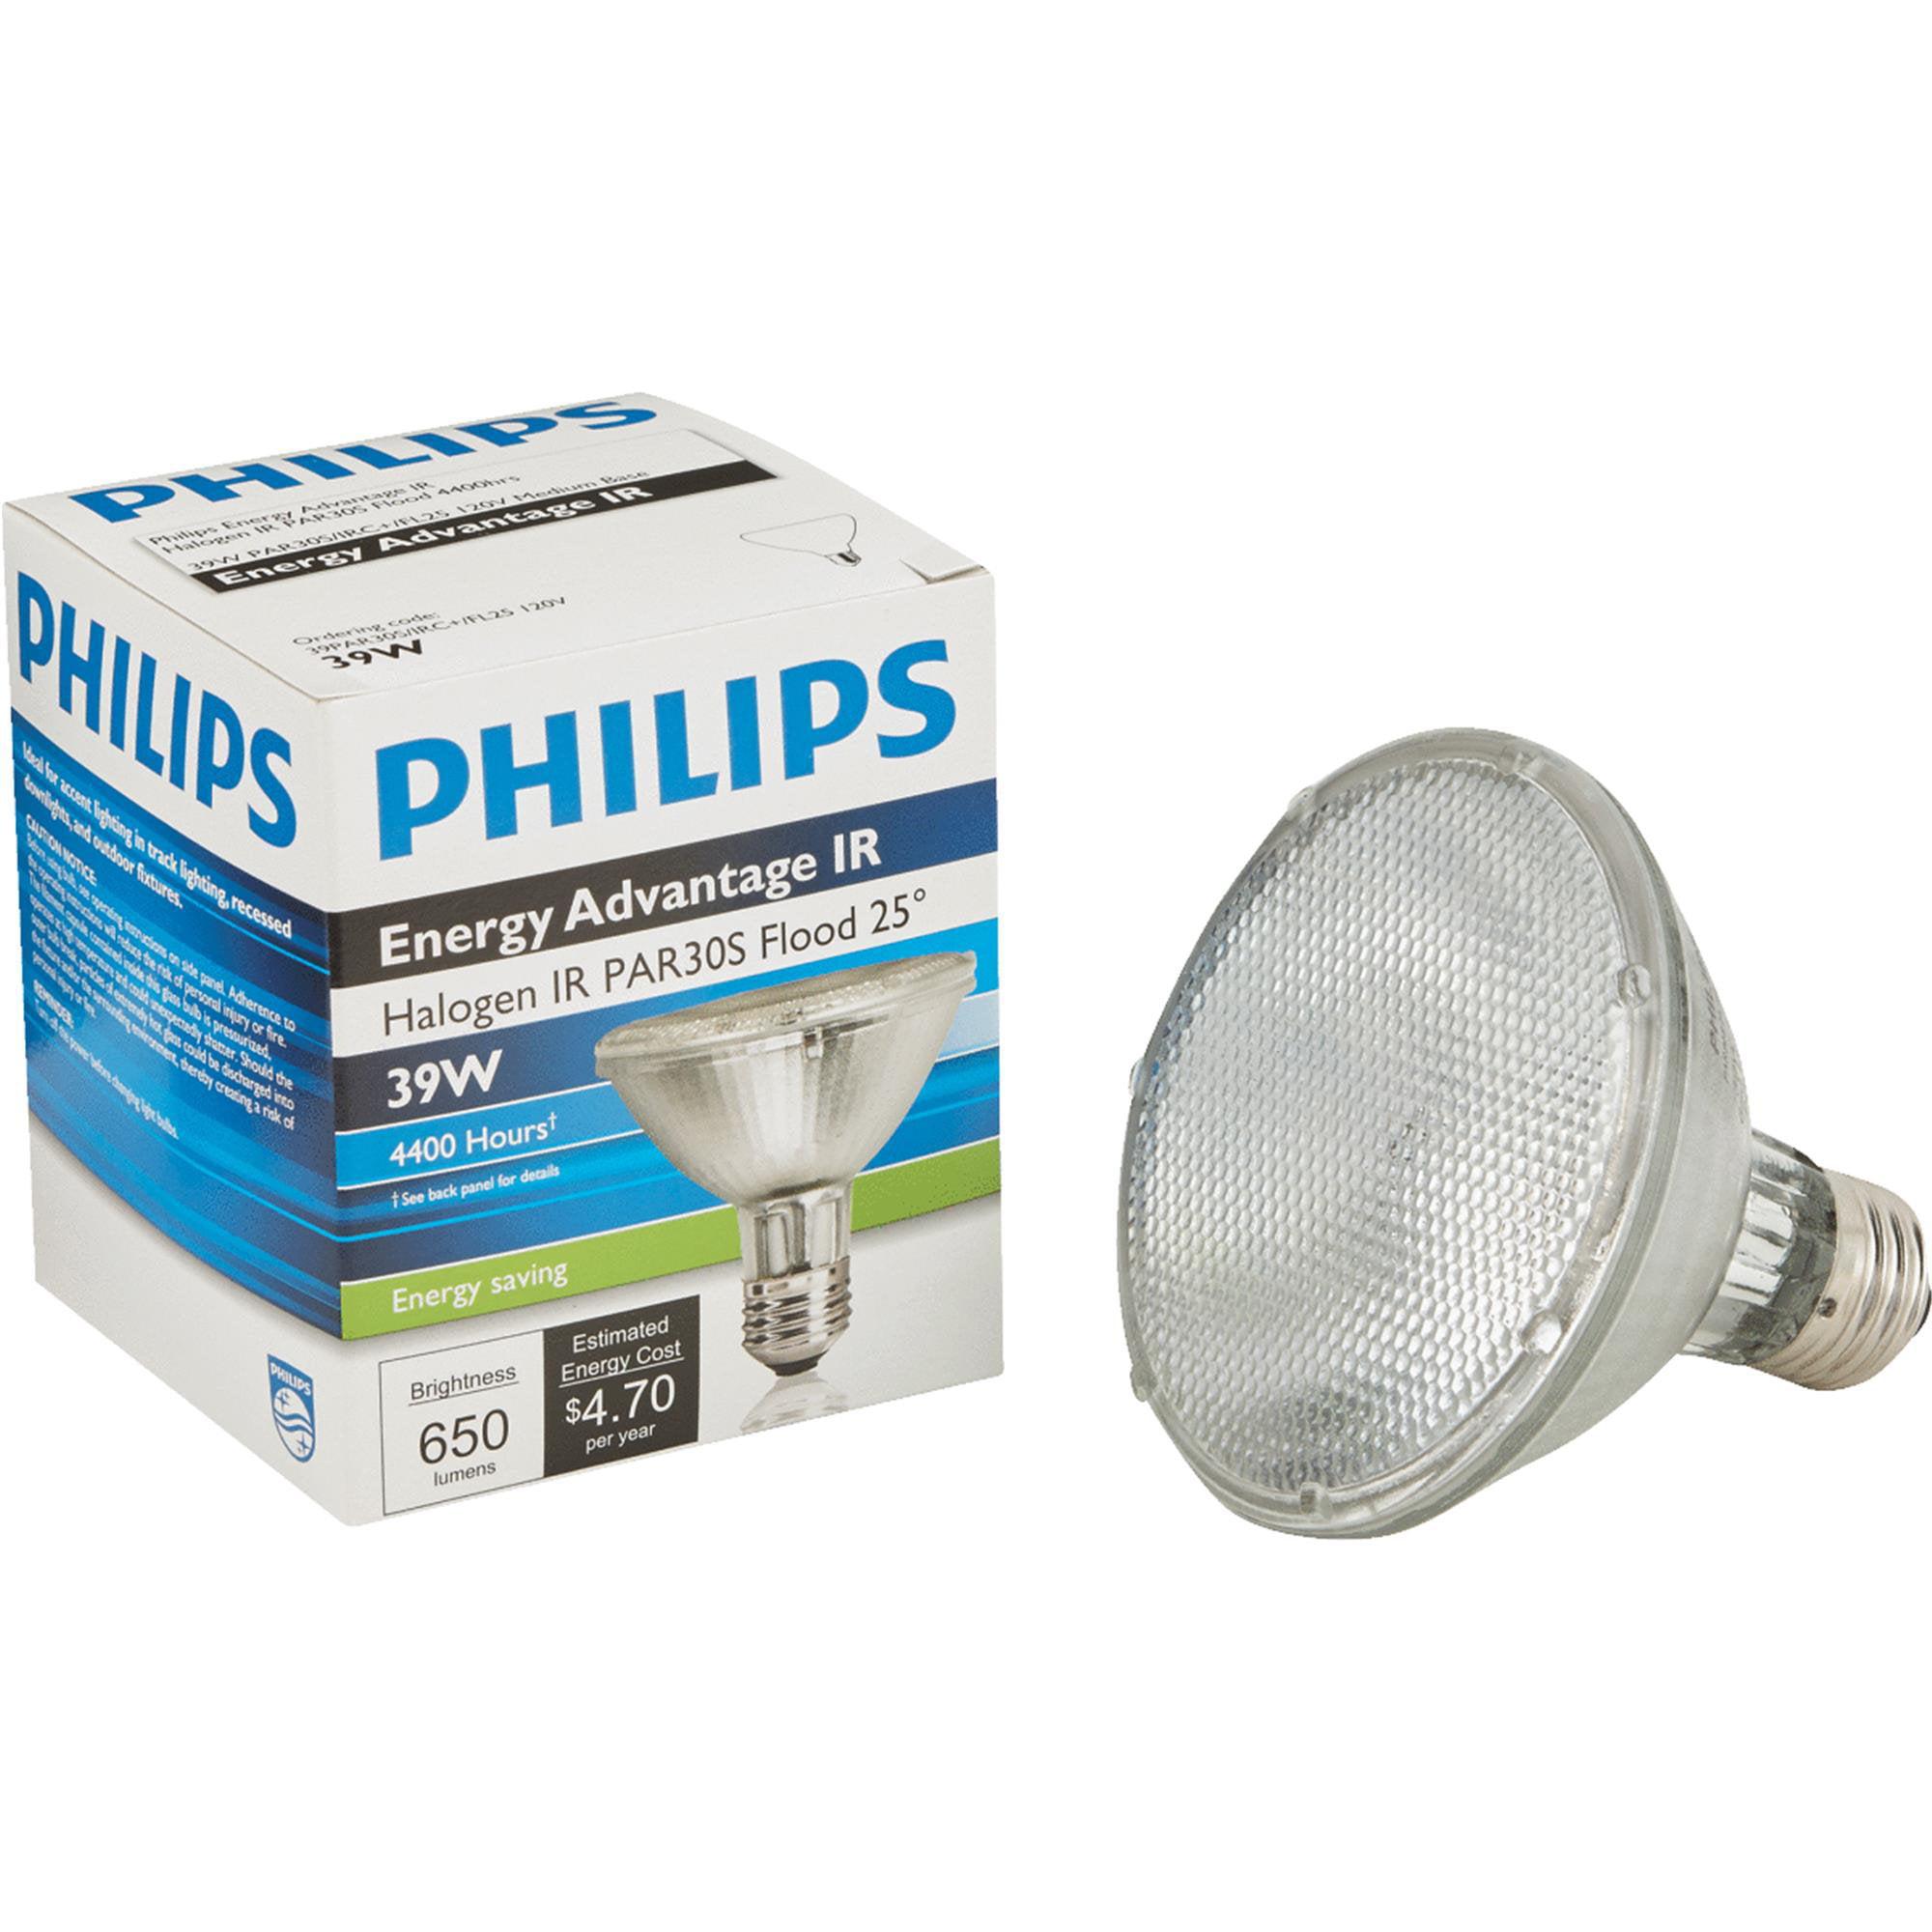 Philips Energy Advantage IR PAR30 Halogen Floodlight Light Bulb